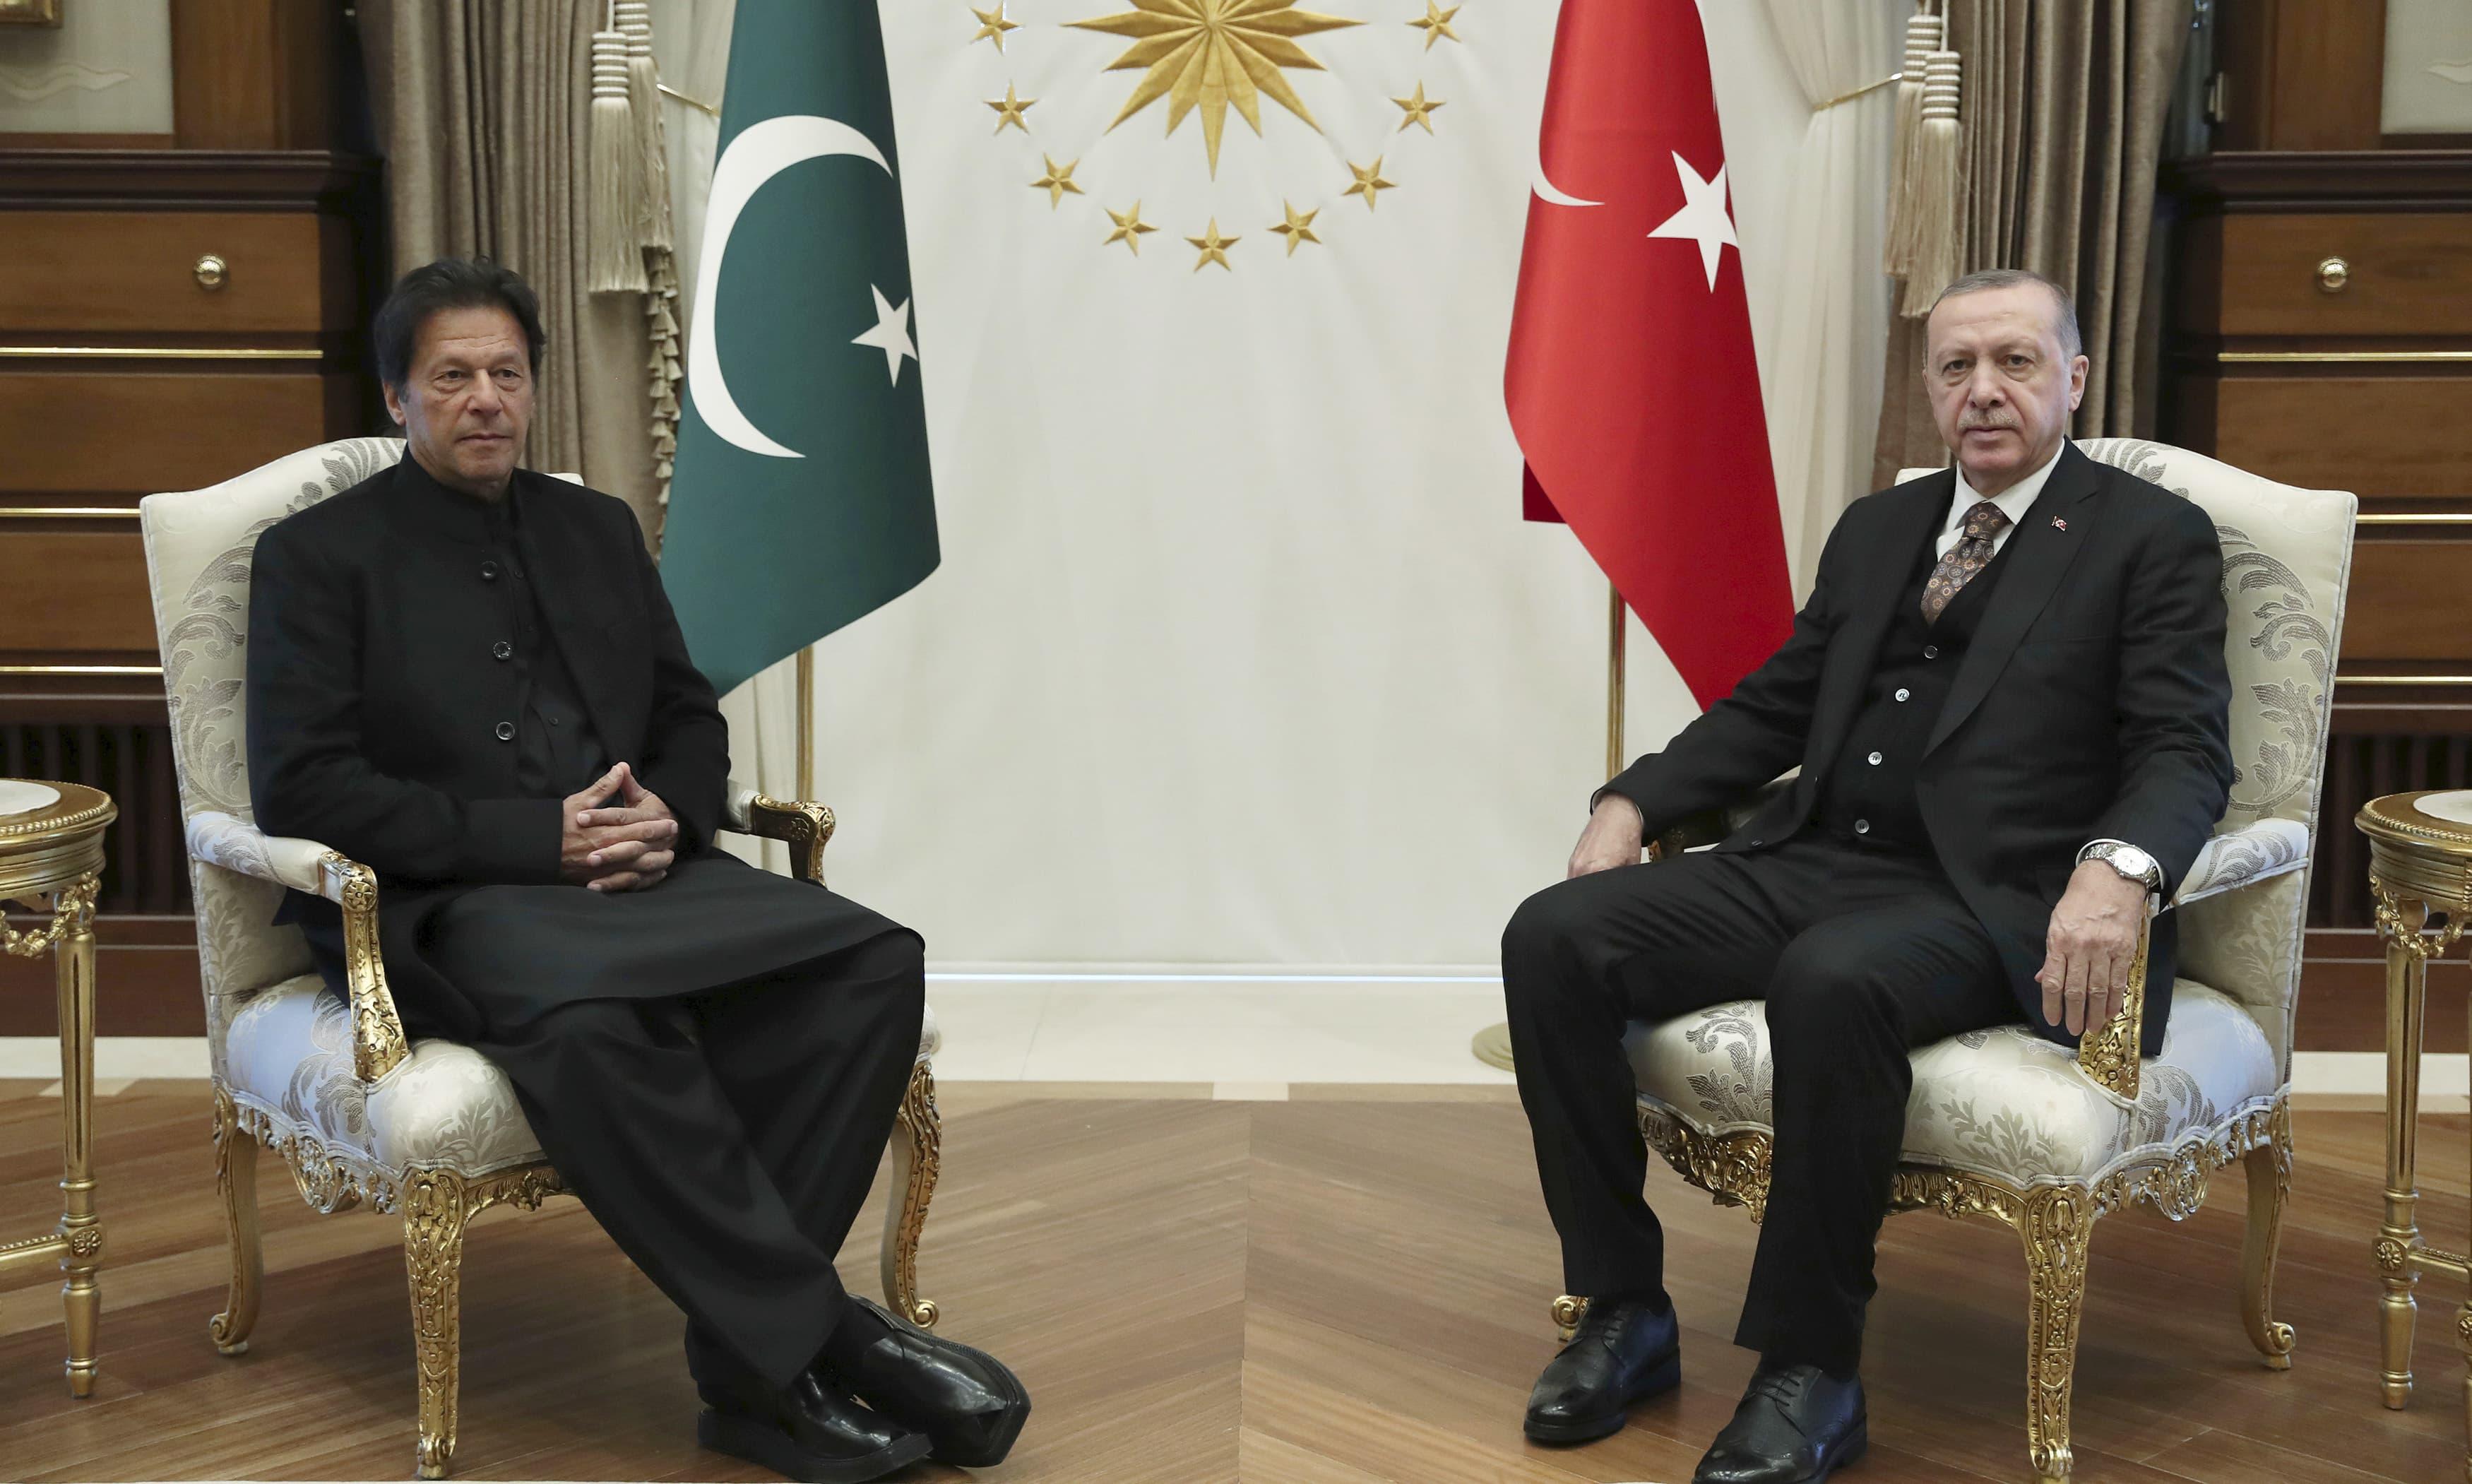 Turkey's President Recep Tayyip Erdogan and PM Imran Khan pose for the media before a meeting in Ankara. —AP